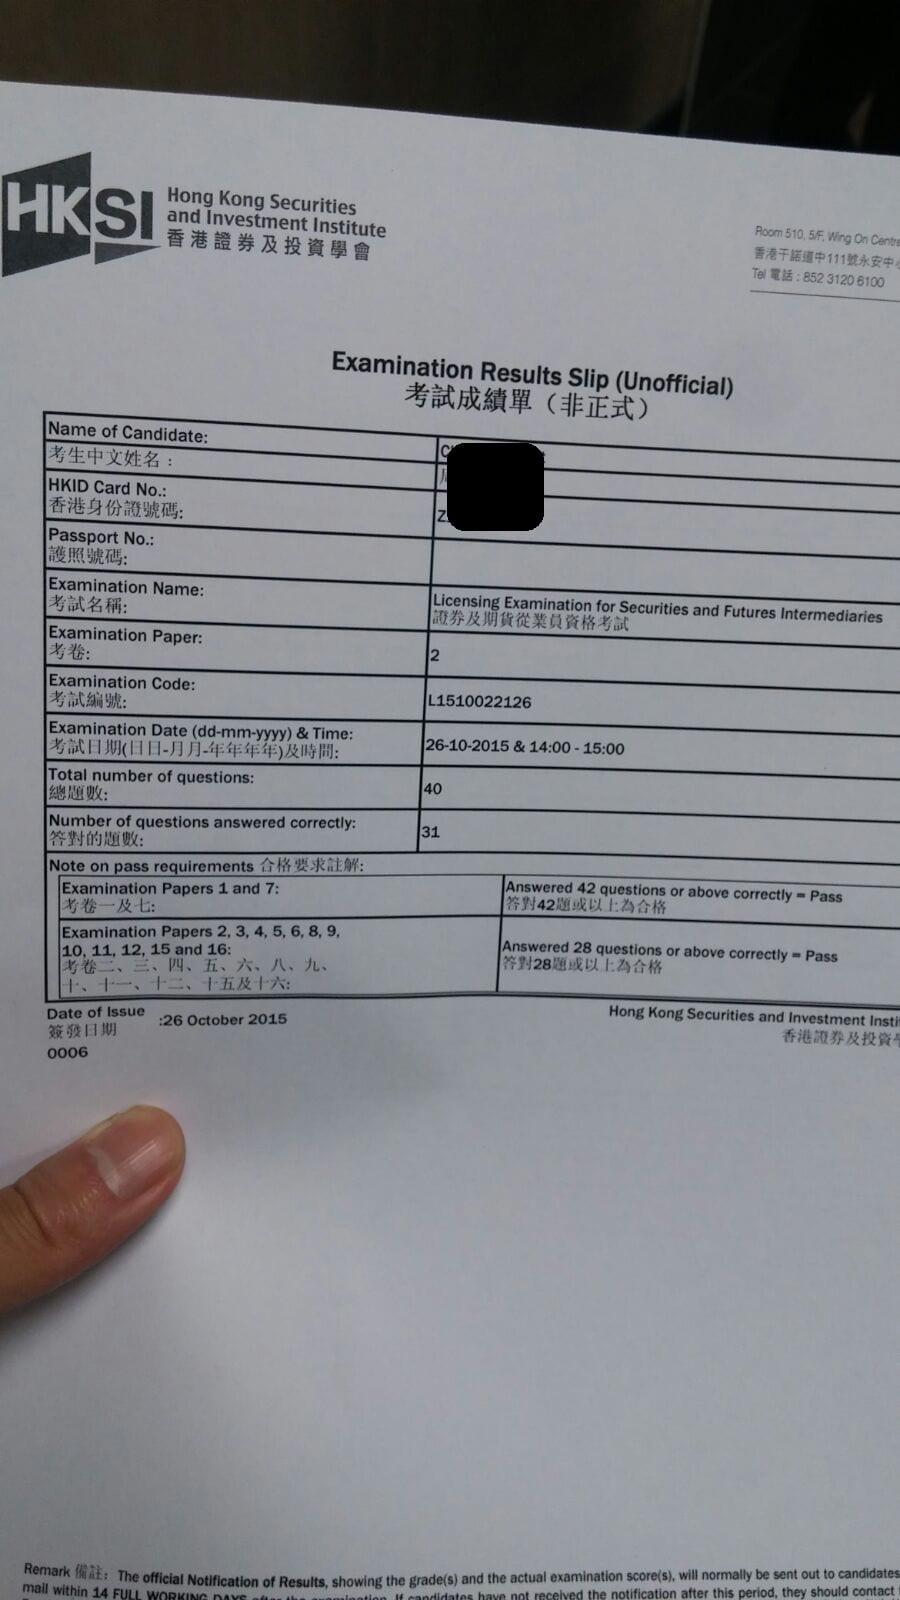 Stephenchow 26/10/2015 LE Paper 1 證券期貨從業員資格考試卷一 Pass